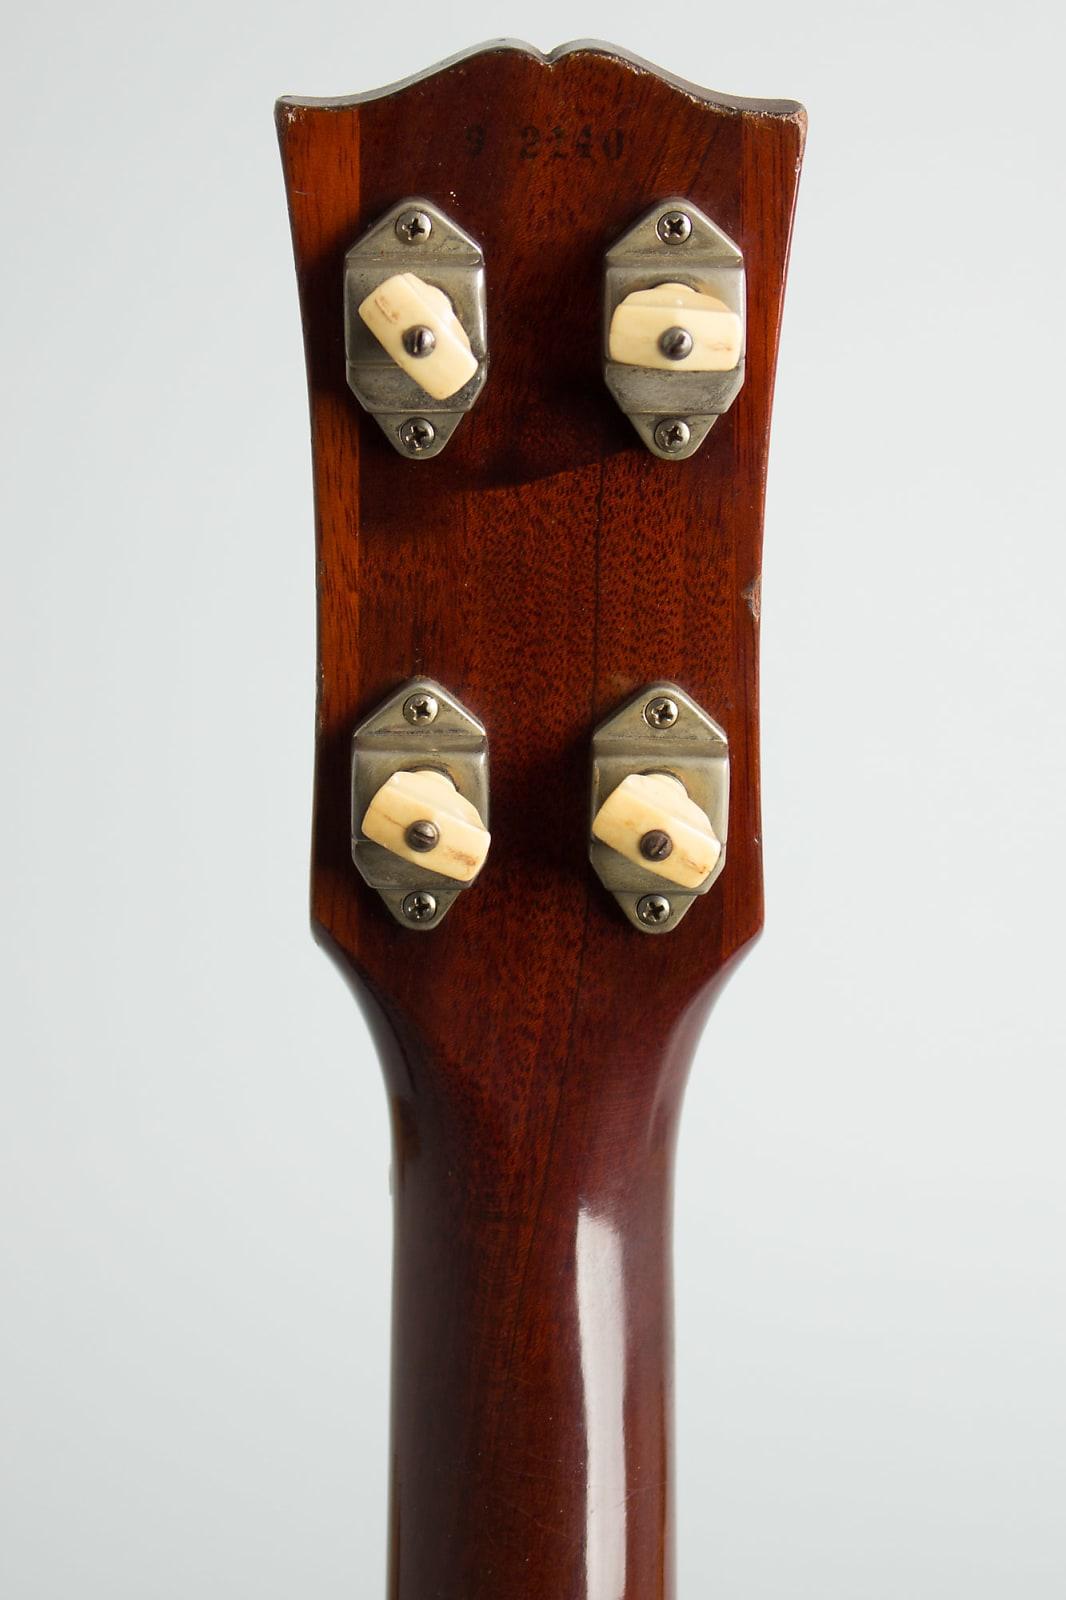 Gibson  EB-0 Solid Body Electric Bass Guitar (1959), ser. #9-2140, NO CASE case.